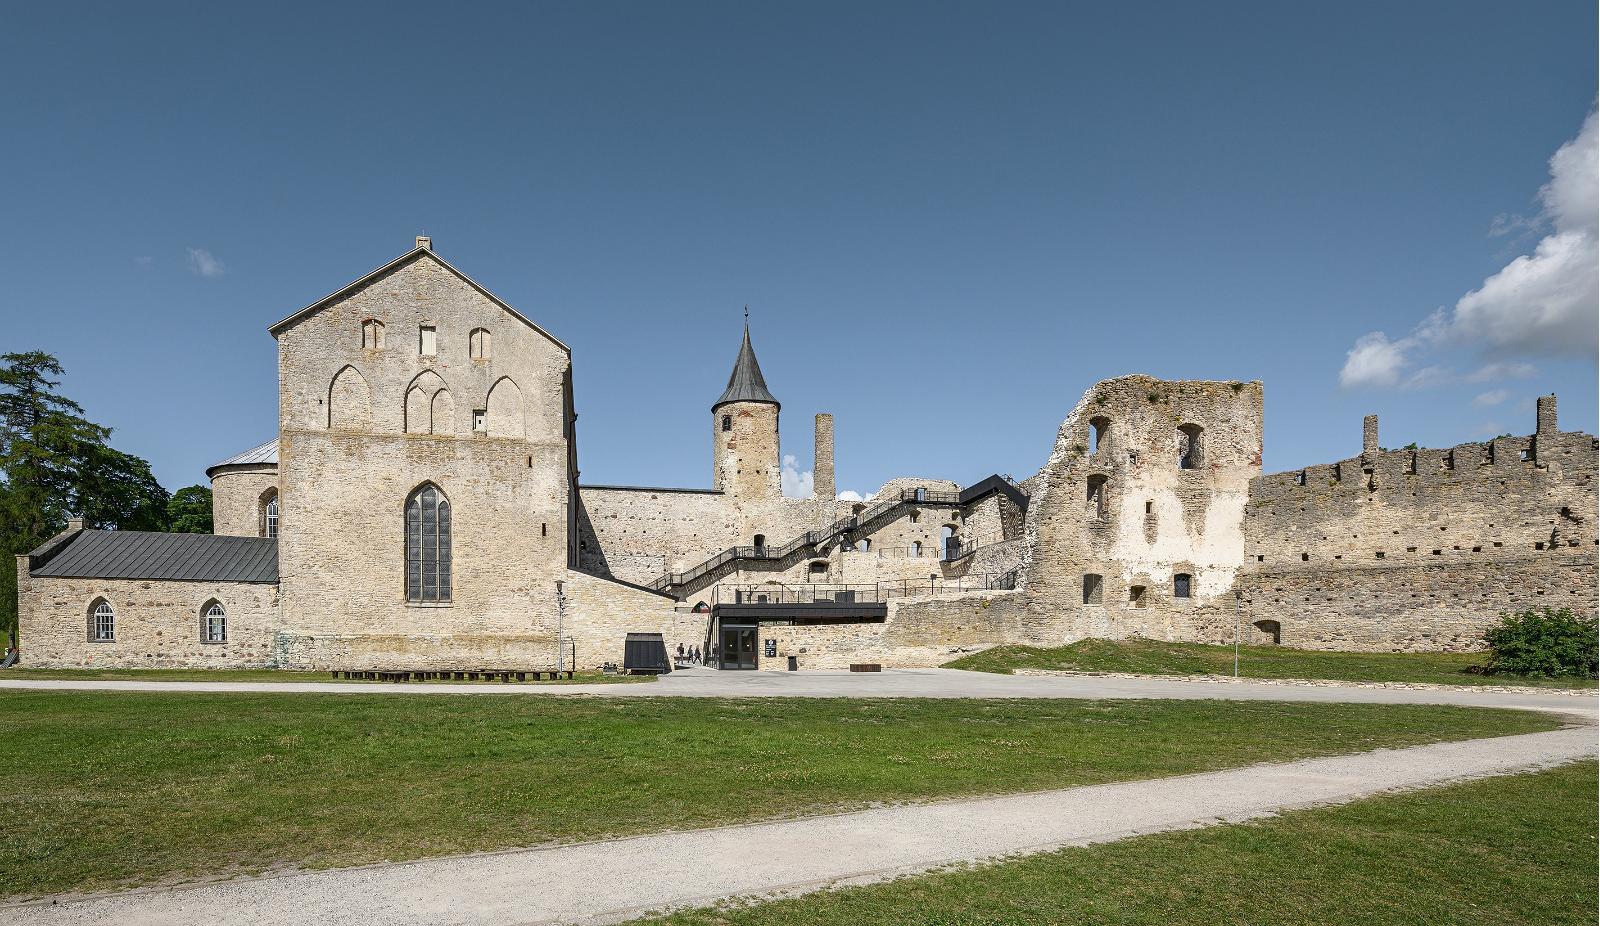 قلعه اسقف اعظم هاپسالو